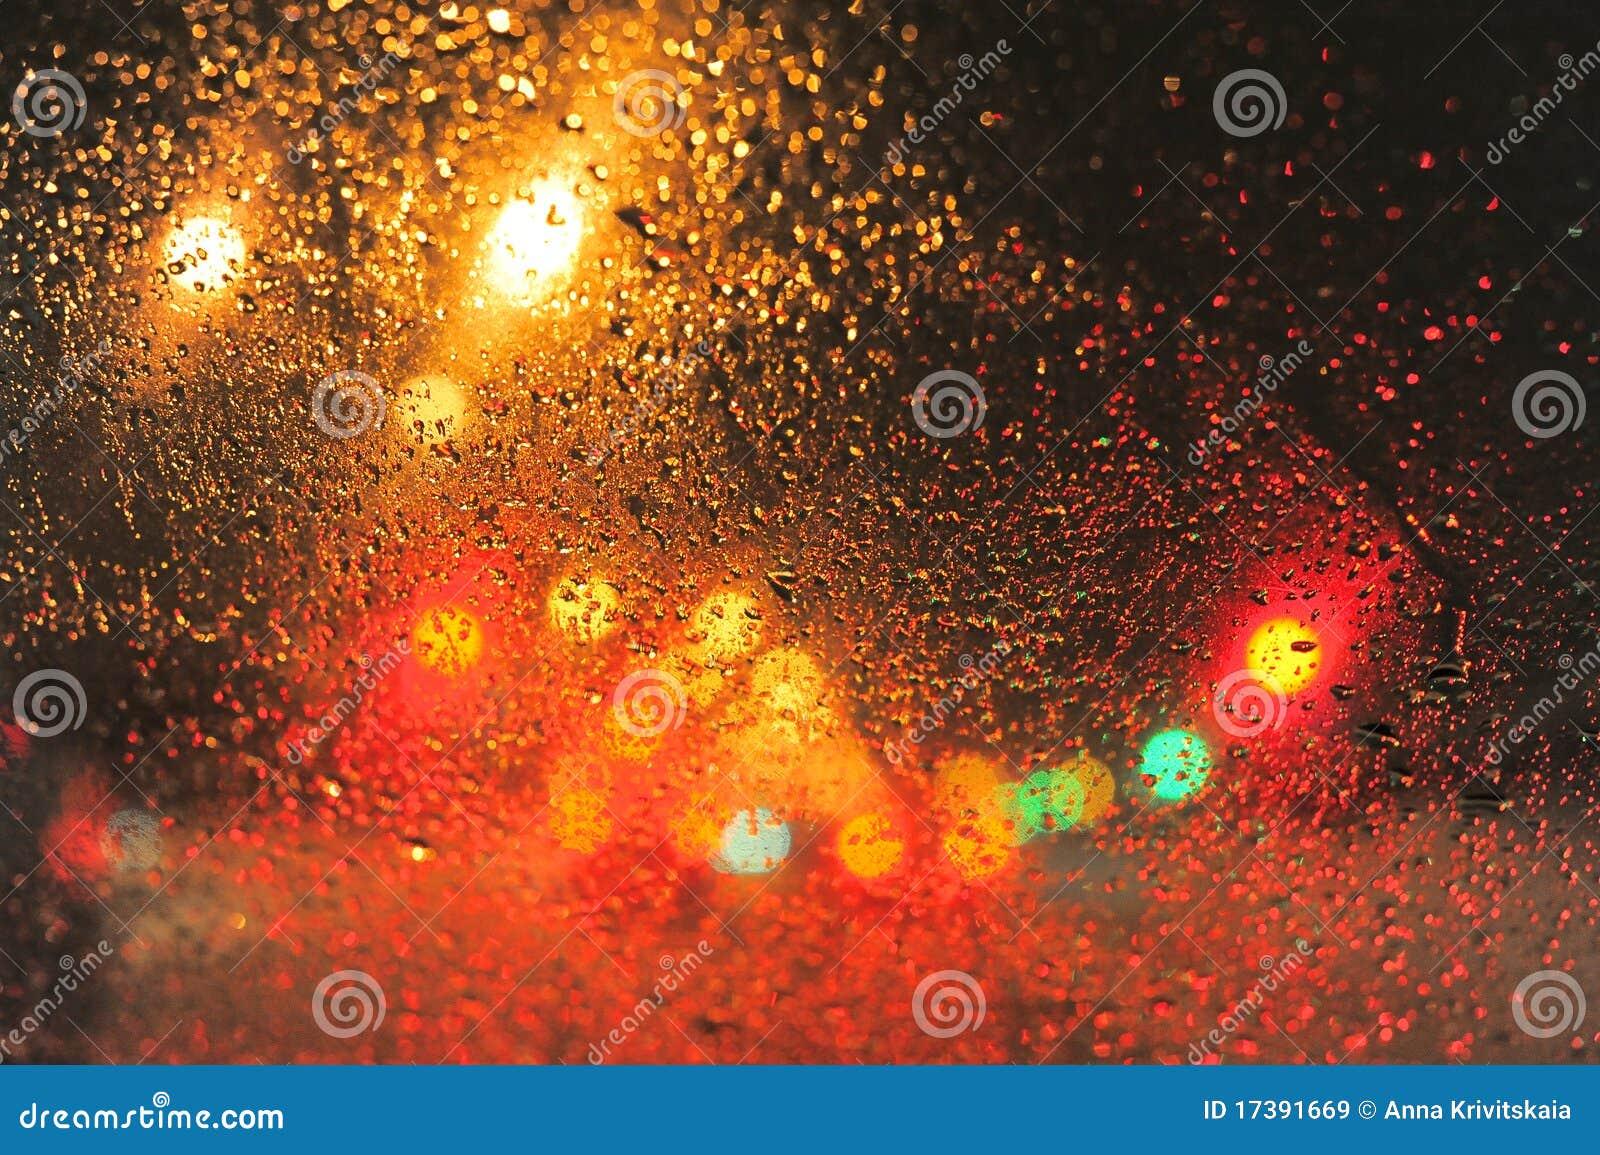 Raindrops Royalty Free Stock Images - Image: 17391669